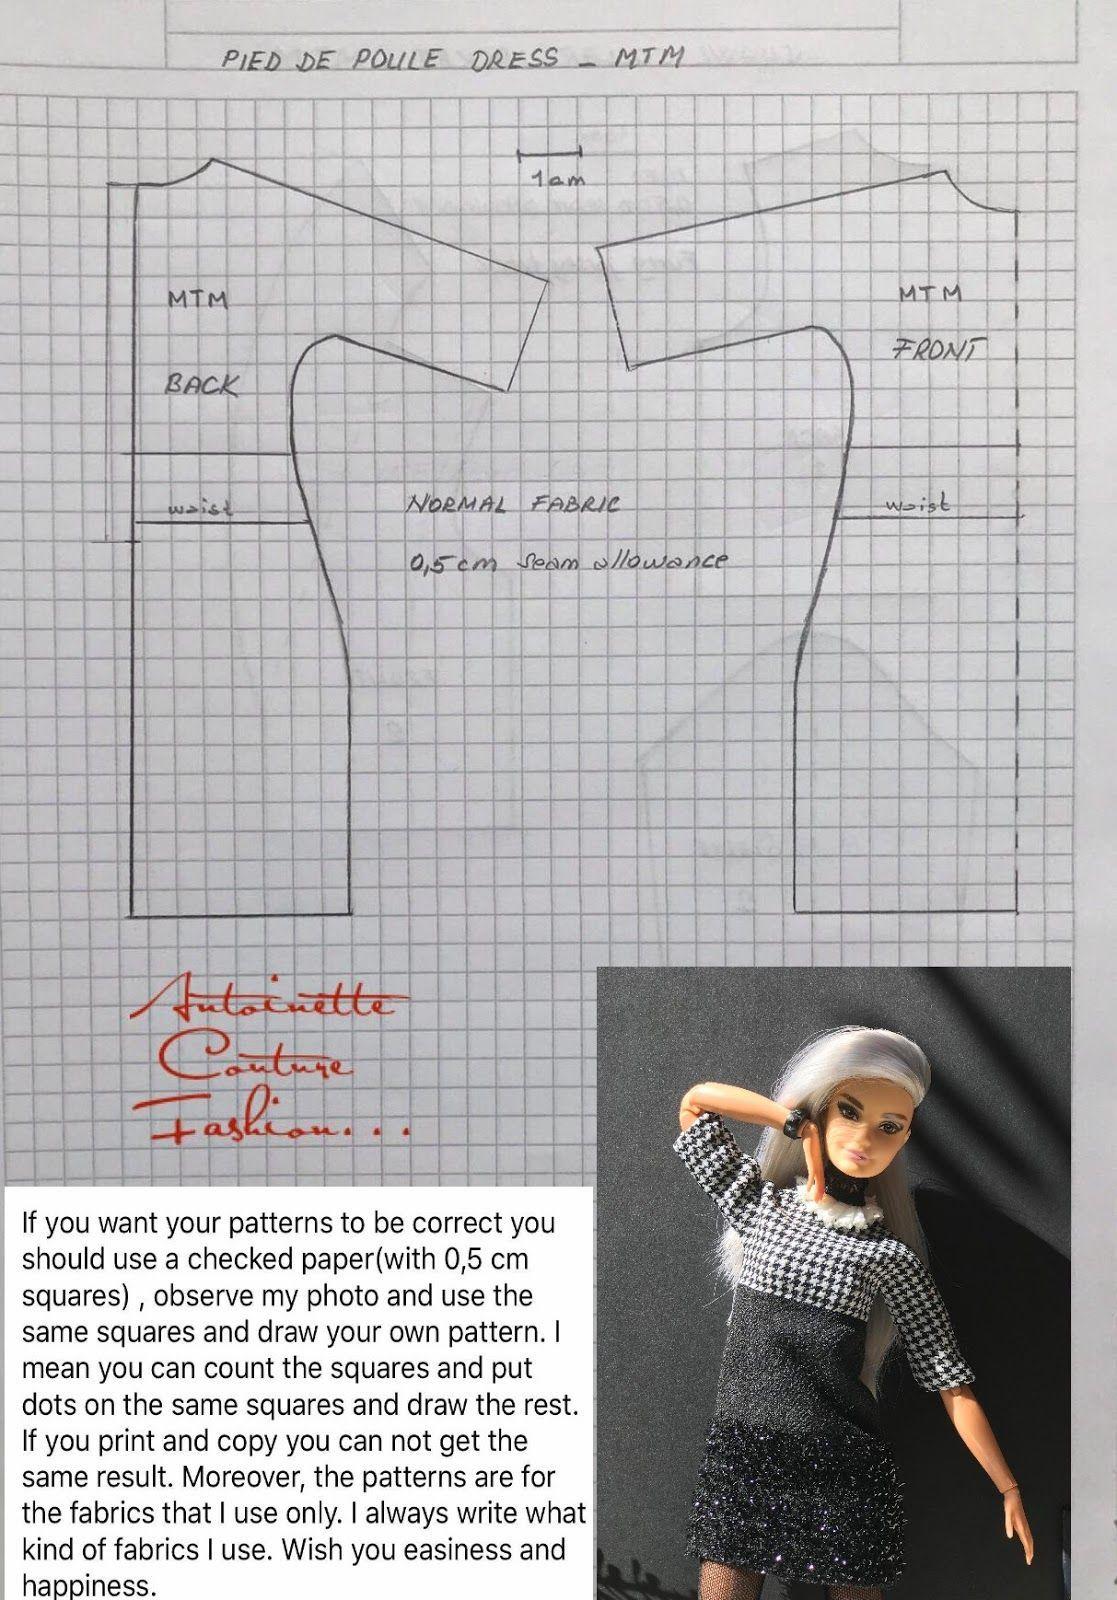 10+ Ineffable Creative Crochet a Doll Ideas #crochetedbarbiedollclothes - liquid exfoliator #dolldresspatterns